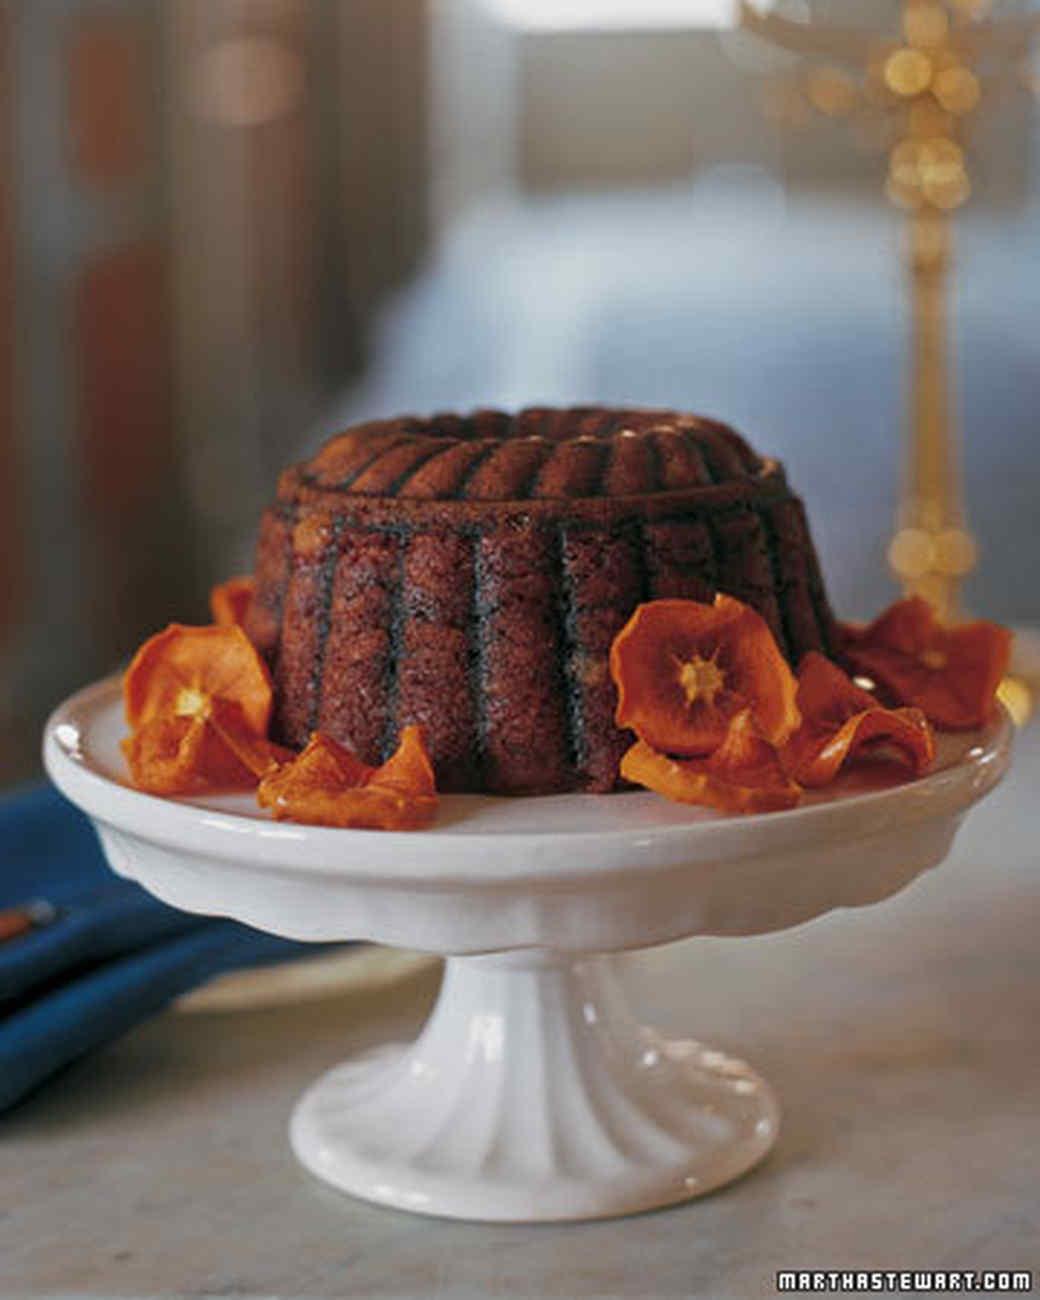 Persimmon Pudding Recipes Steamed persimmon pudding recipe martha ...